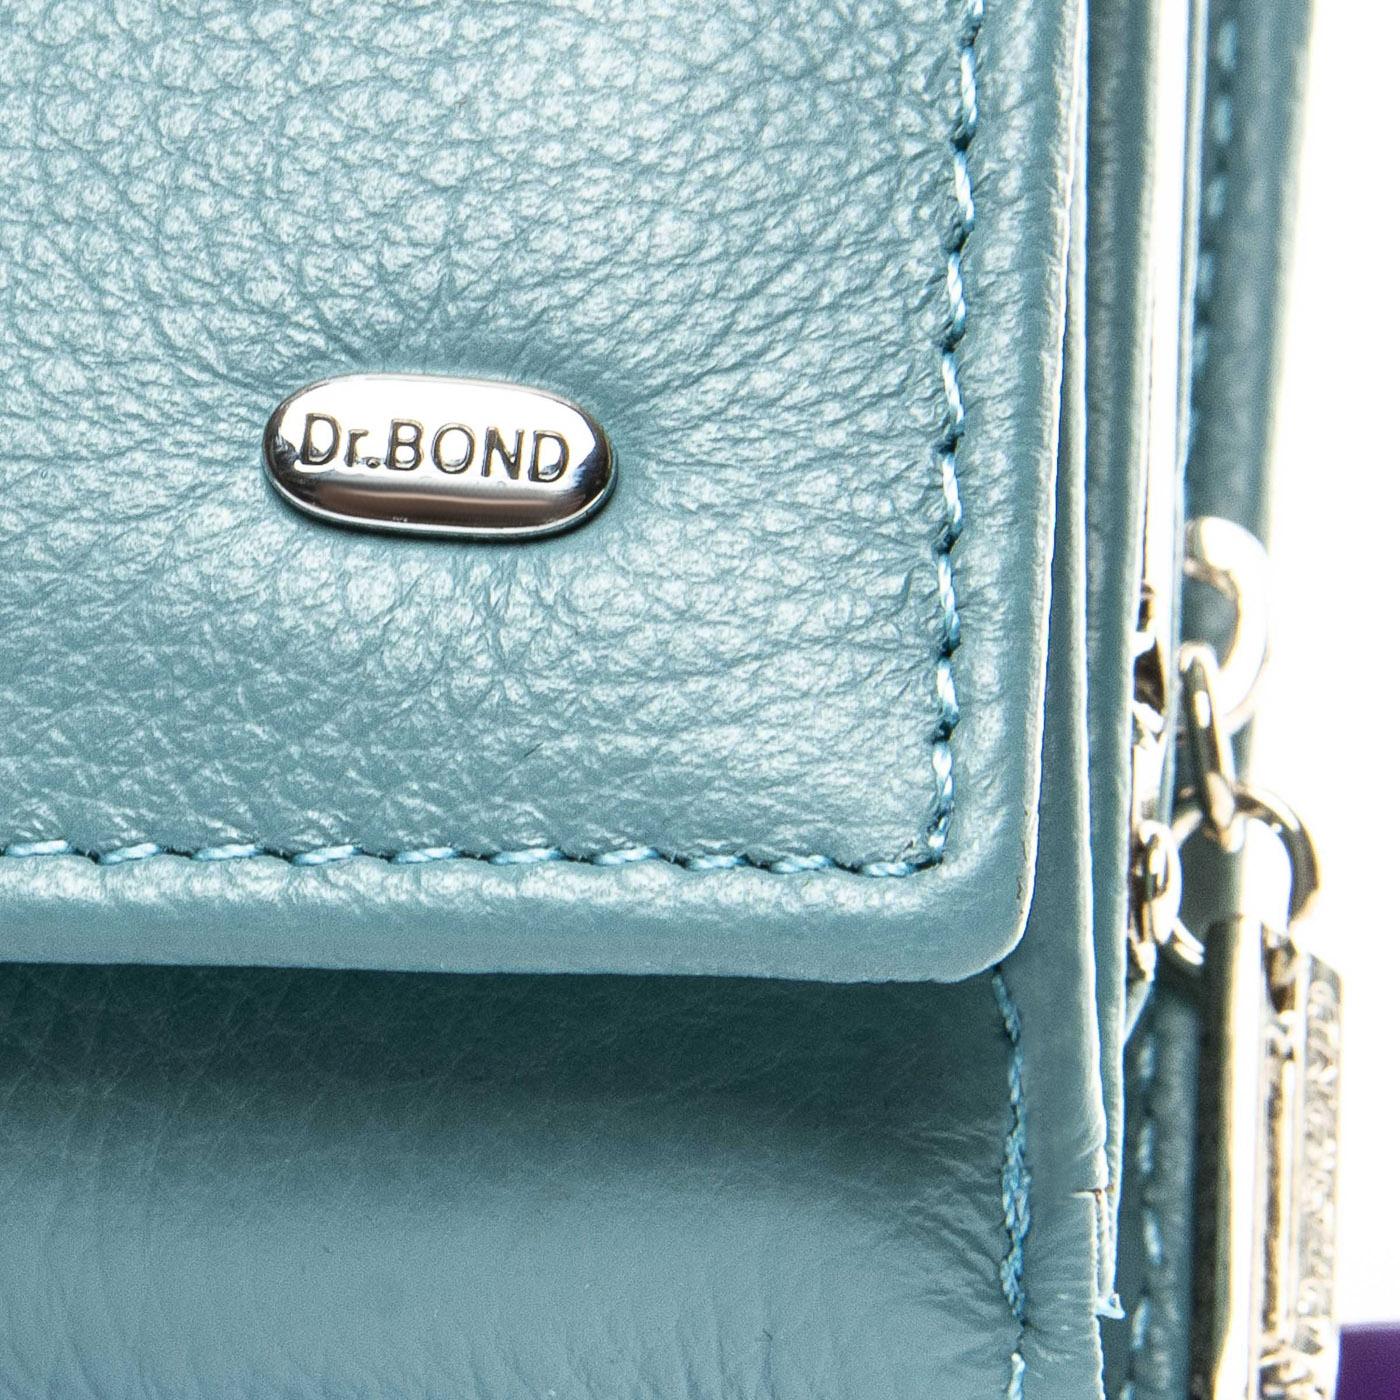 Кошелек Classic кожа DR. BOND WS-10 light-blue - фото 3